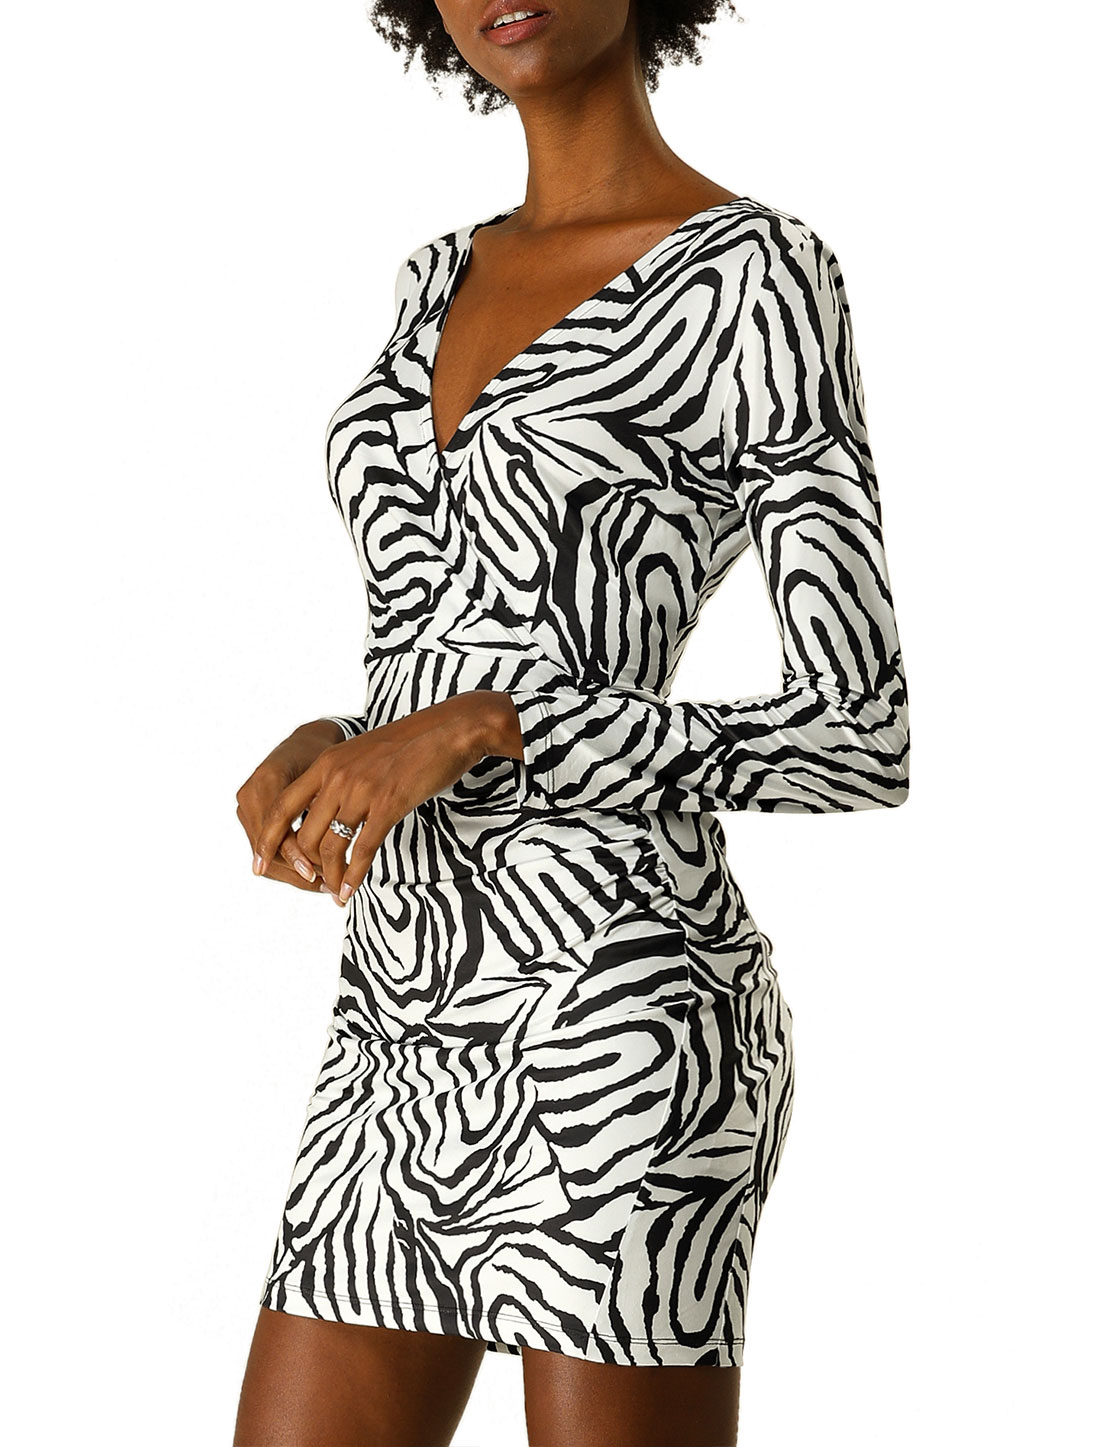 Allegra K Women's Sexy Long Sleeve Stretchy Bodycon Mini Dress Black M